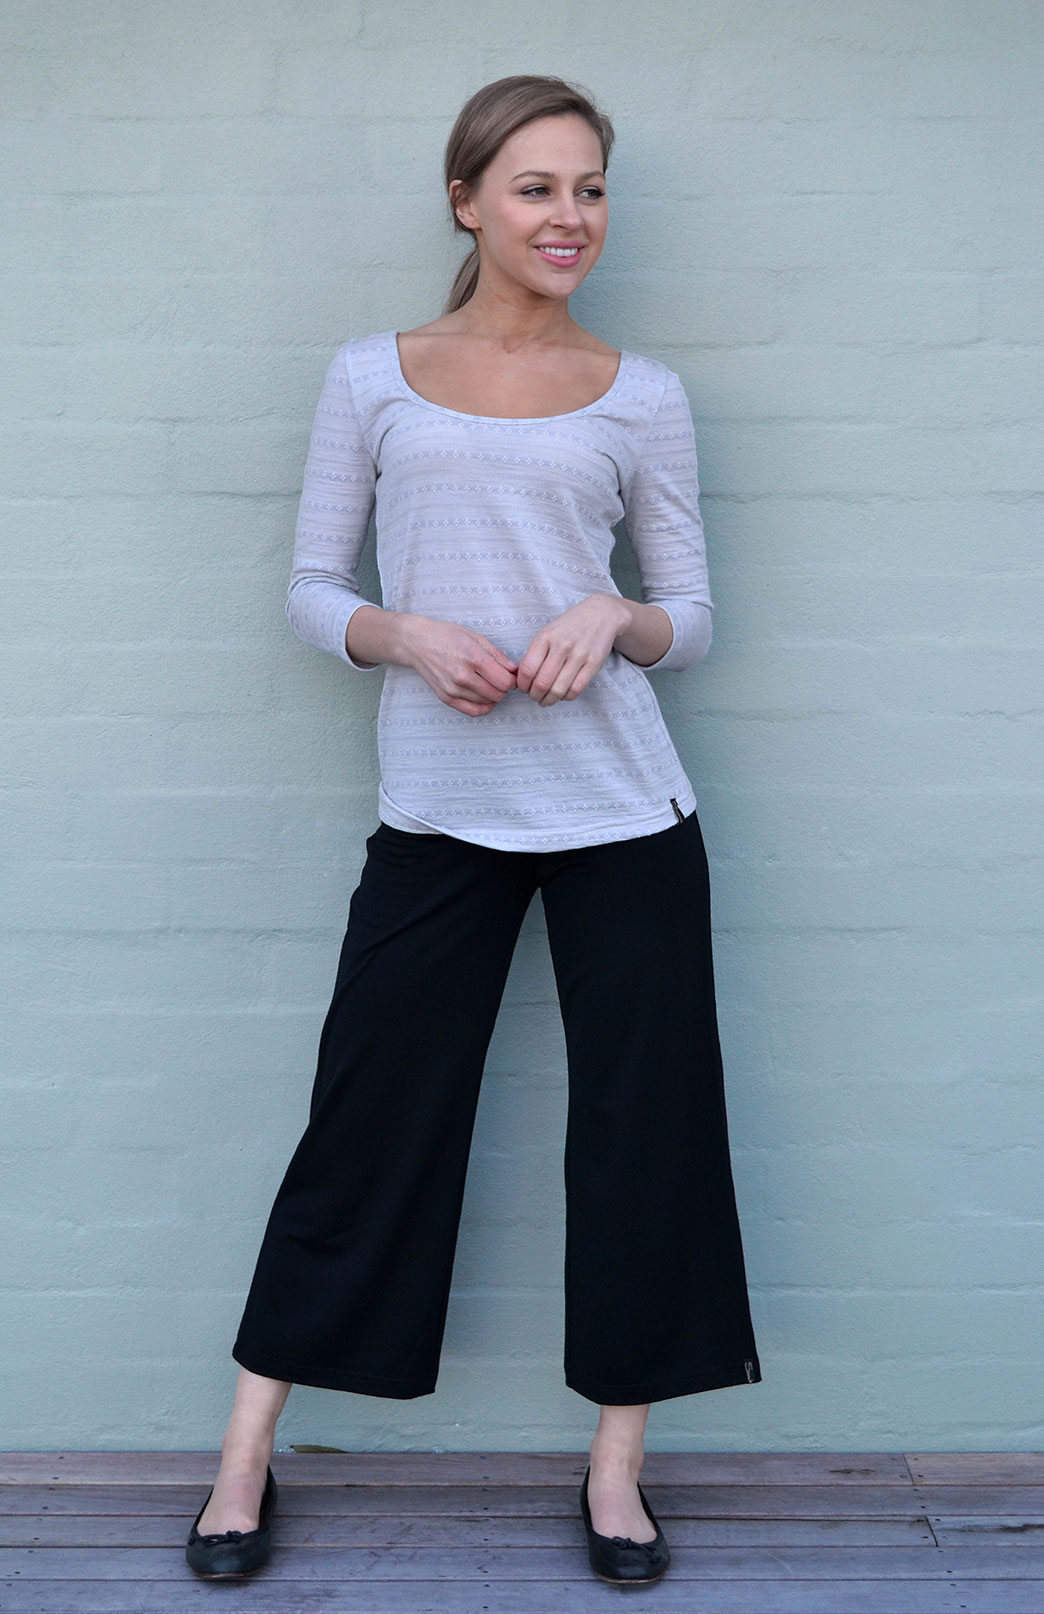 3/4 Yoga Pants - Women's Black Merino Wool Lightweight 3/4 Length Yoga Activewear Pants - Smitten Merino Tasmania Australia